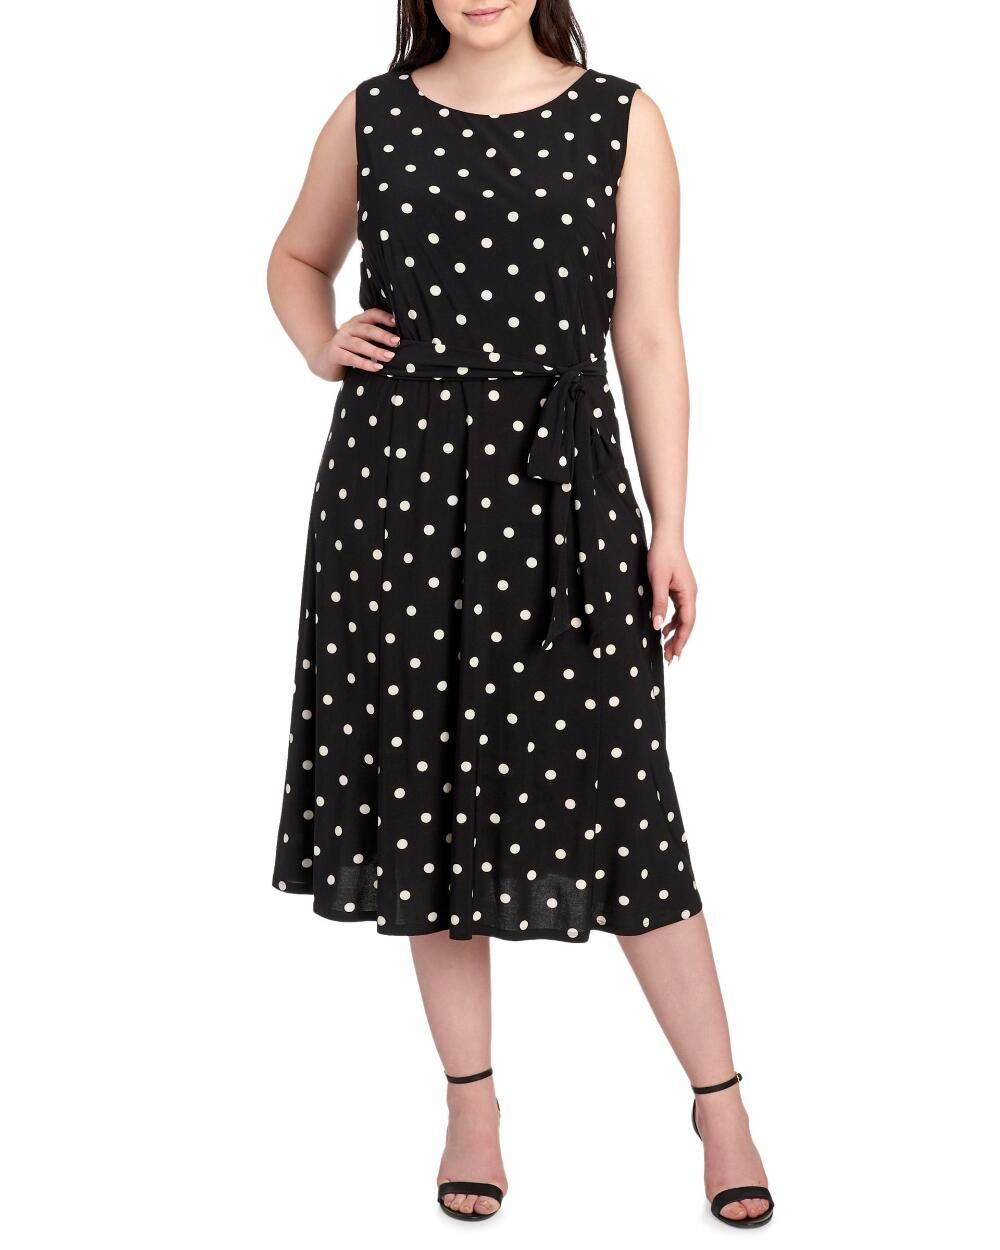 4d8d63b14b4f Women's Plus Size Polka Dot Fit & Flare Dress-Dresses-Plus Size-Women | Stein  Mart